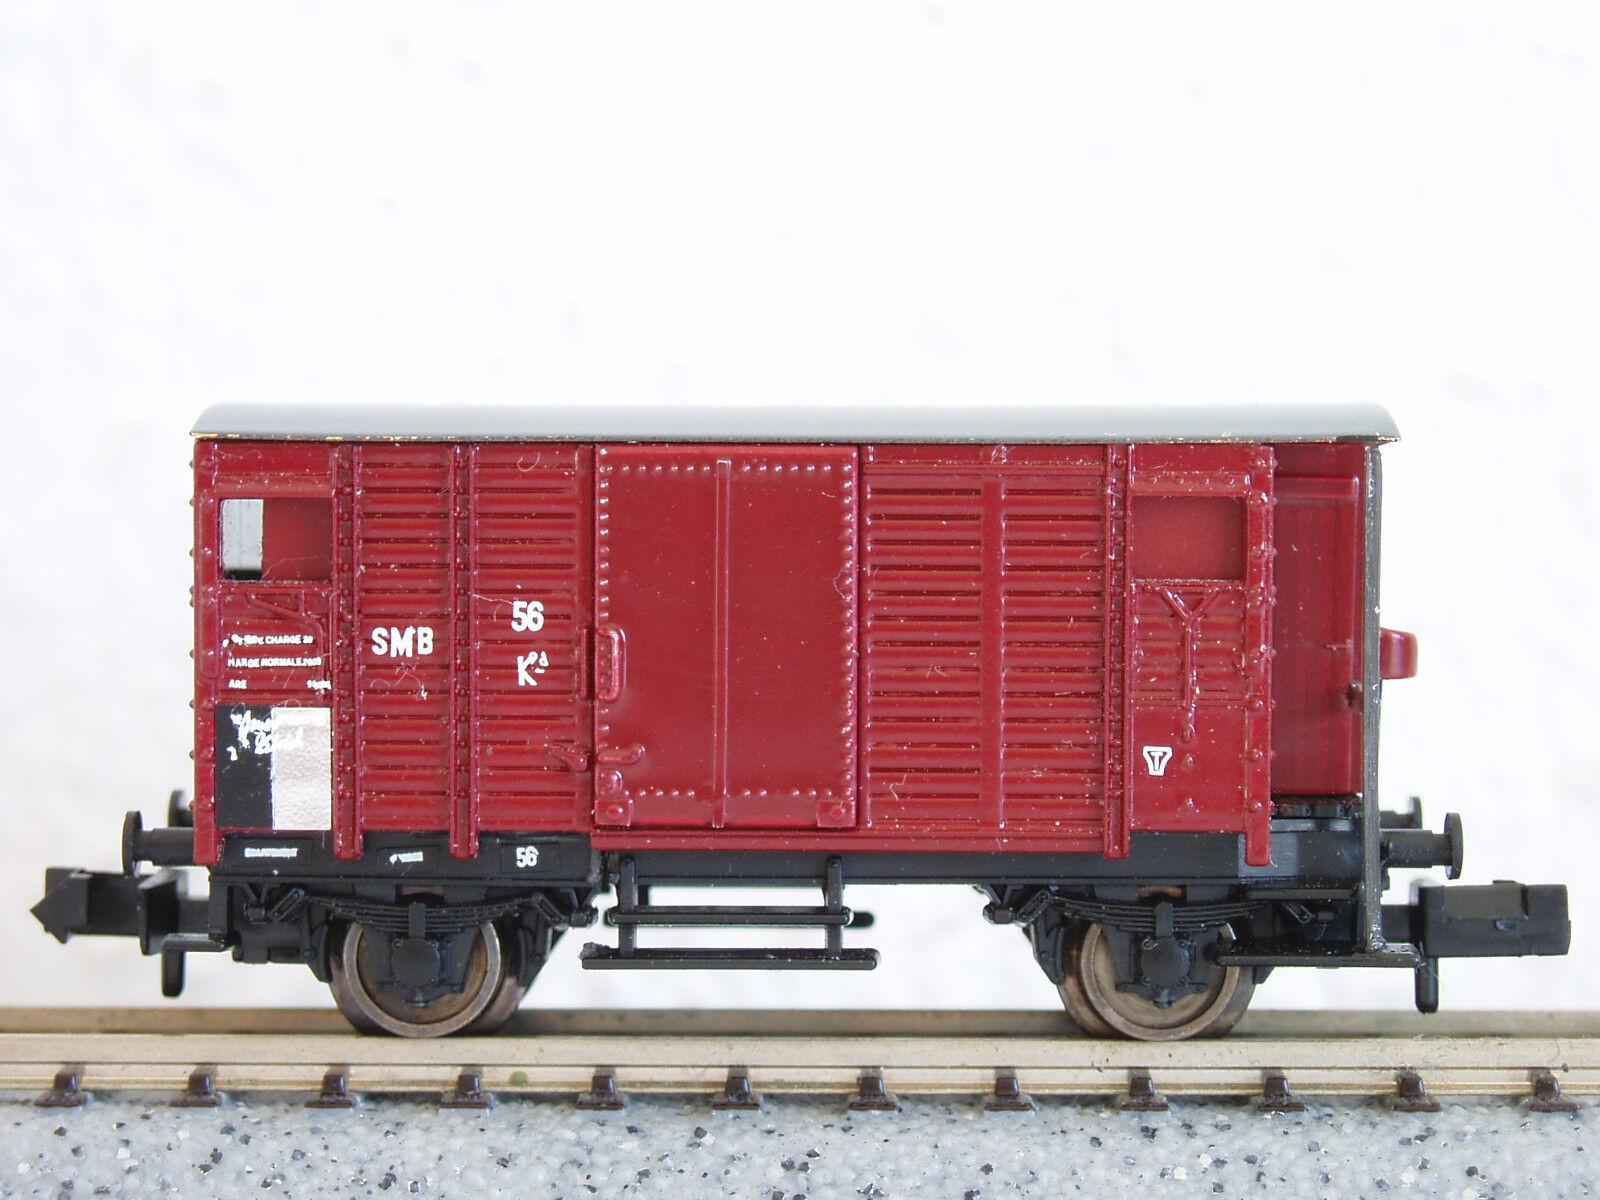 SMB K24 braun 56   2459  JURETIC Handarbeitsmodell